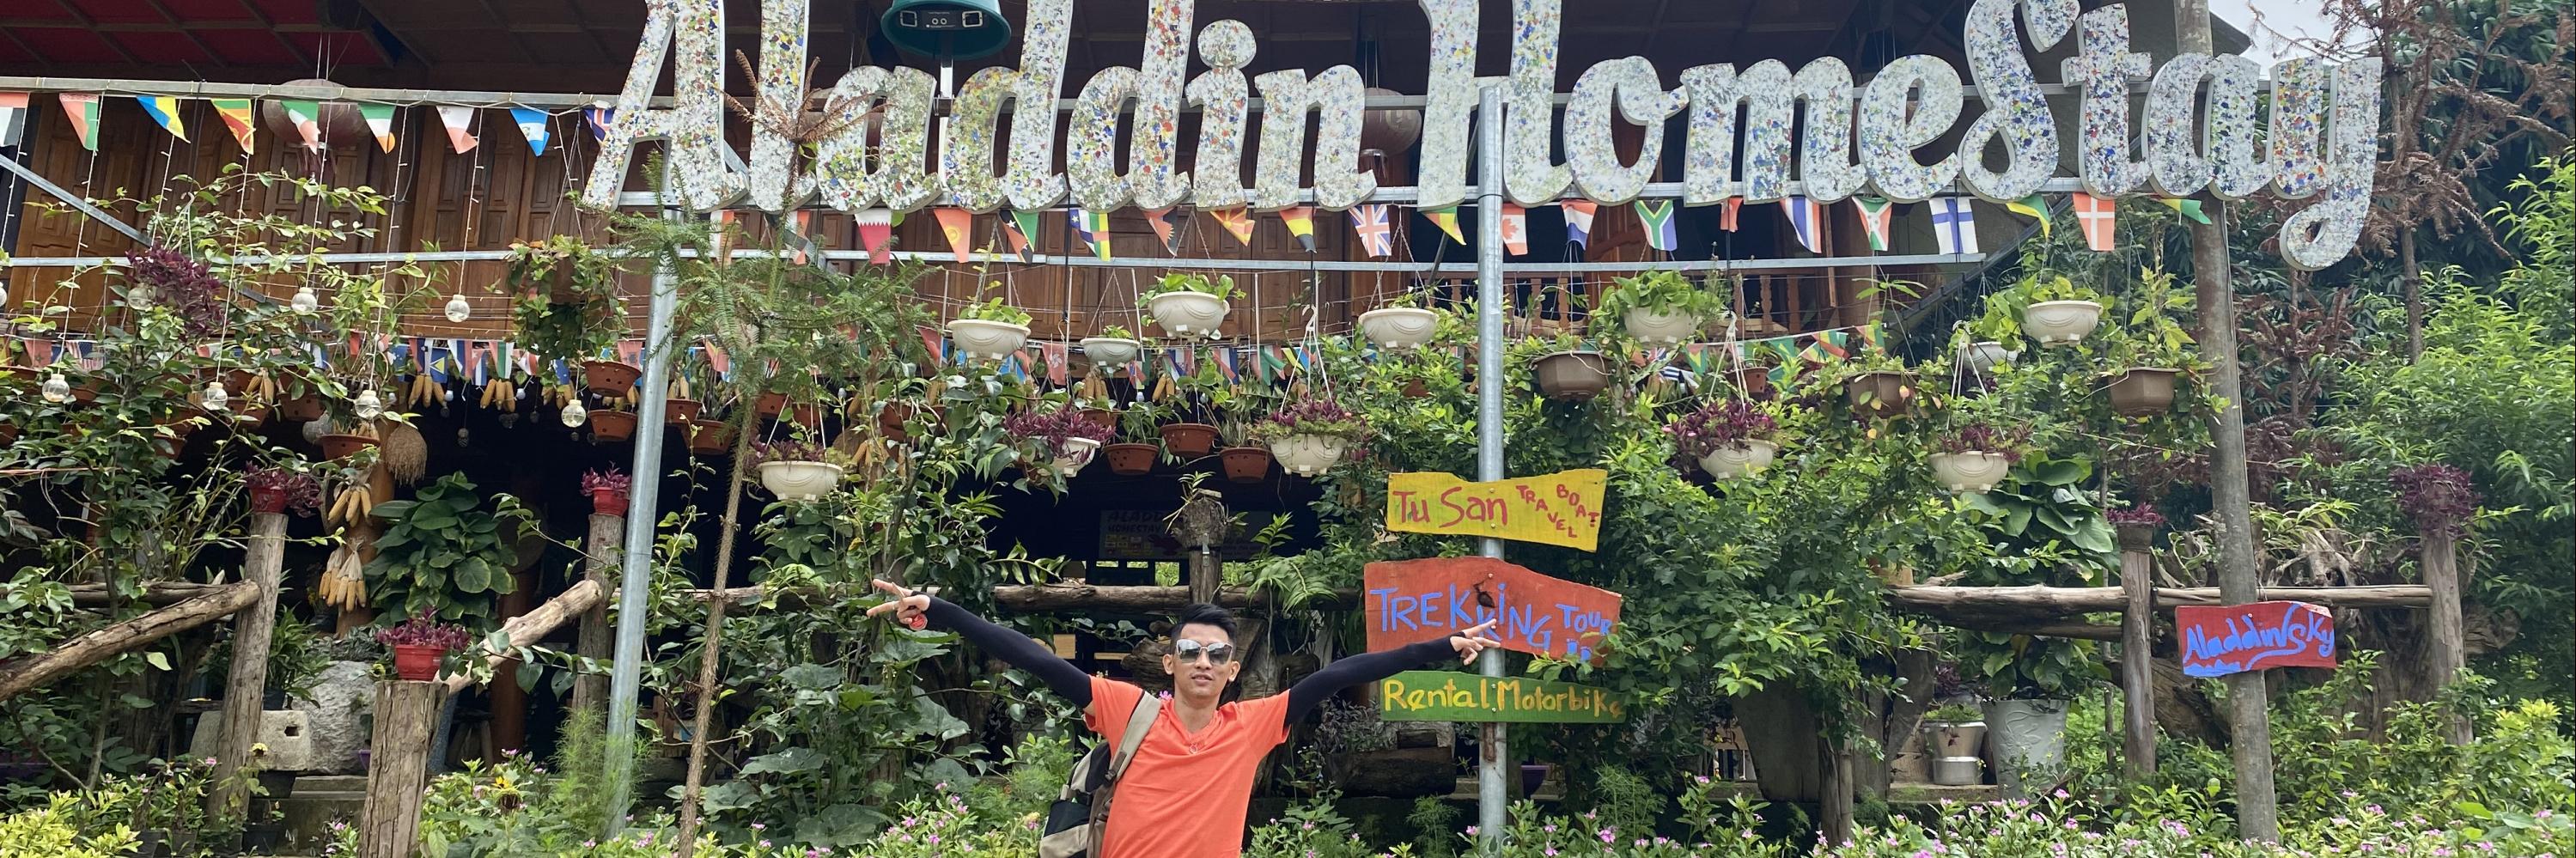 https://gody.vn/blog/trongnguyendo20141965/post/review-homestay-aladdin-tai-ha-giang-nhat-dinh-phai-ghe-6889